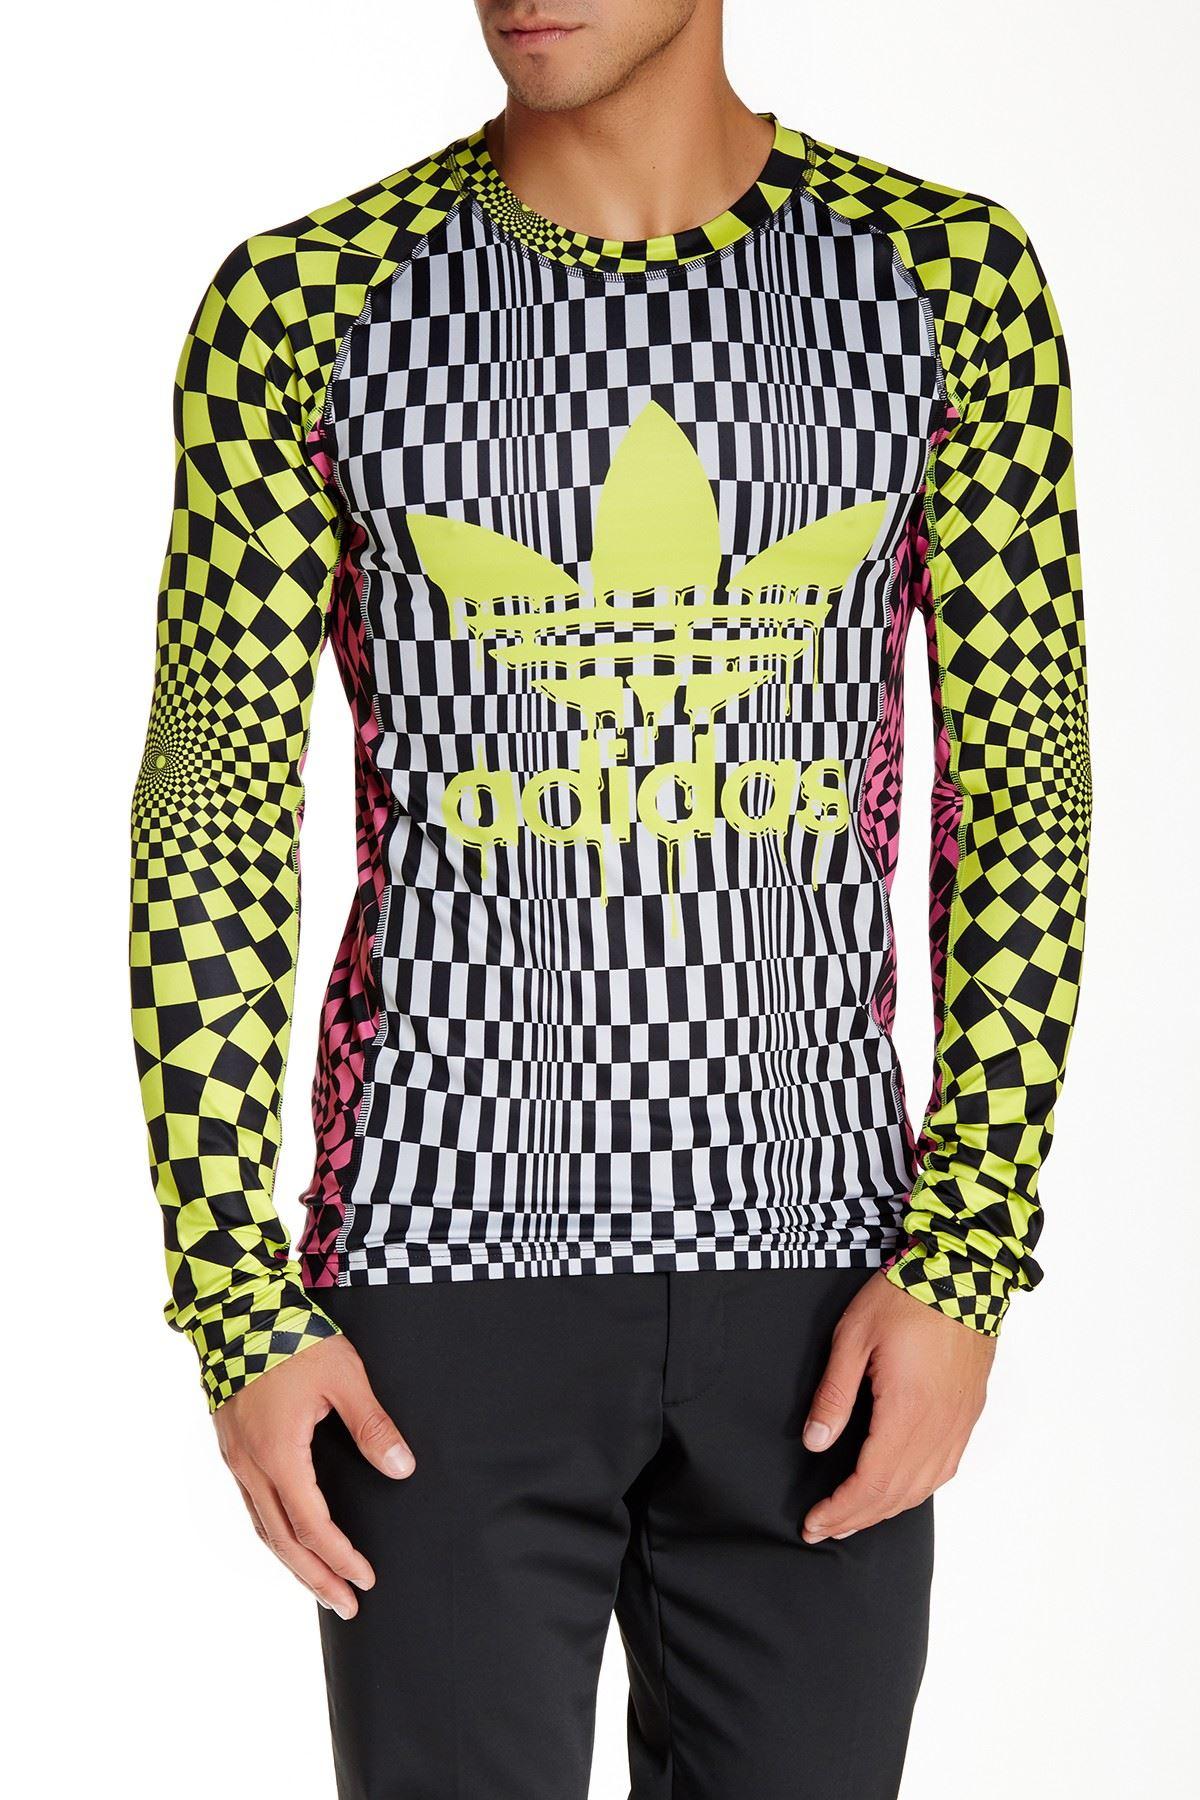 Adidas Jeremy 14979 Scott Opart camiseta de entrenamiento gimnasio para para hombre negro/ multi gimnasio 1d54324 - accademiadellescienzedellumbria.xyz